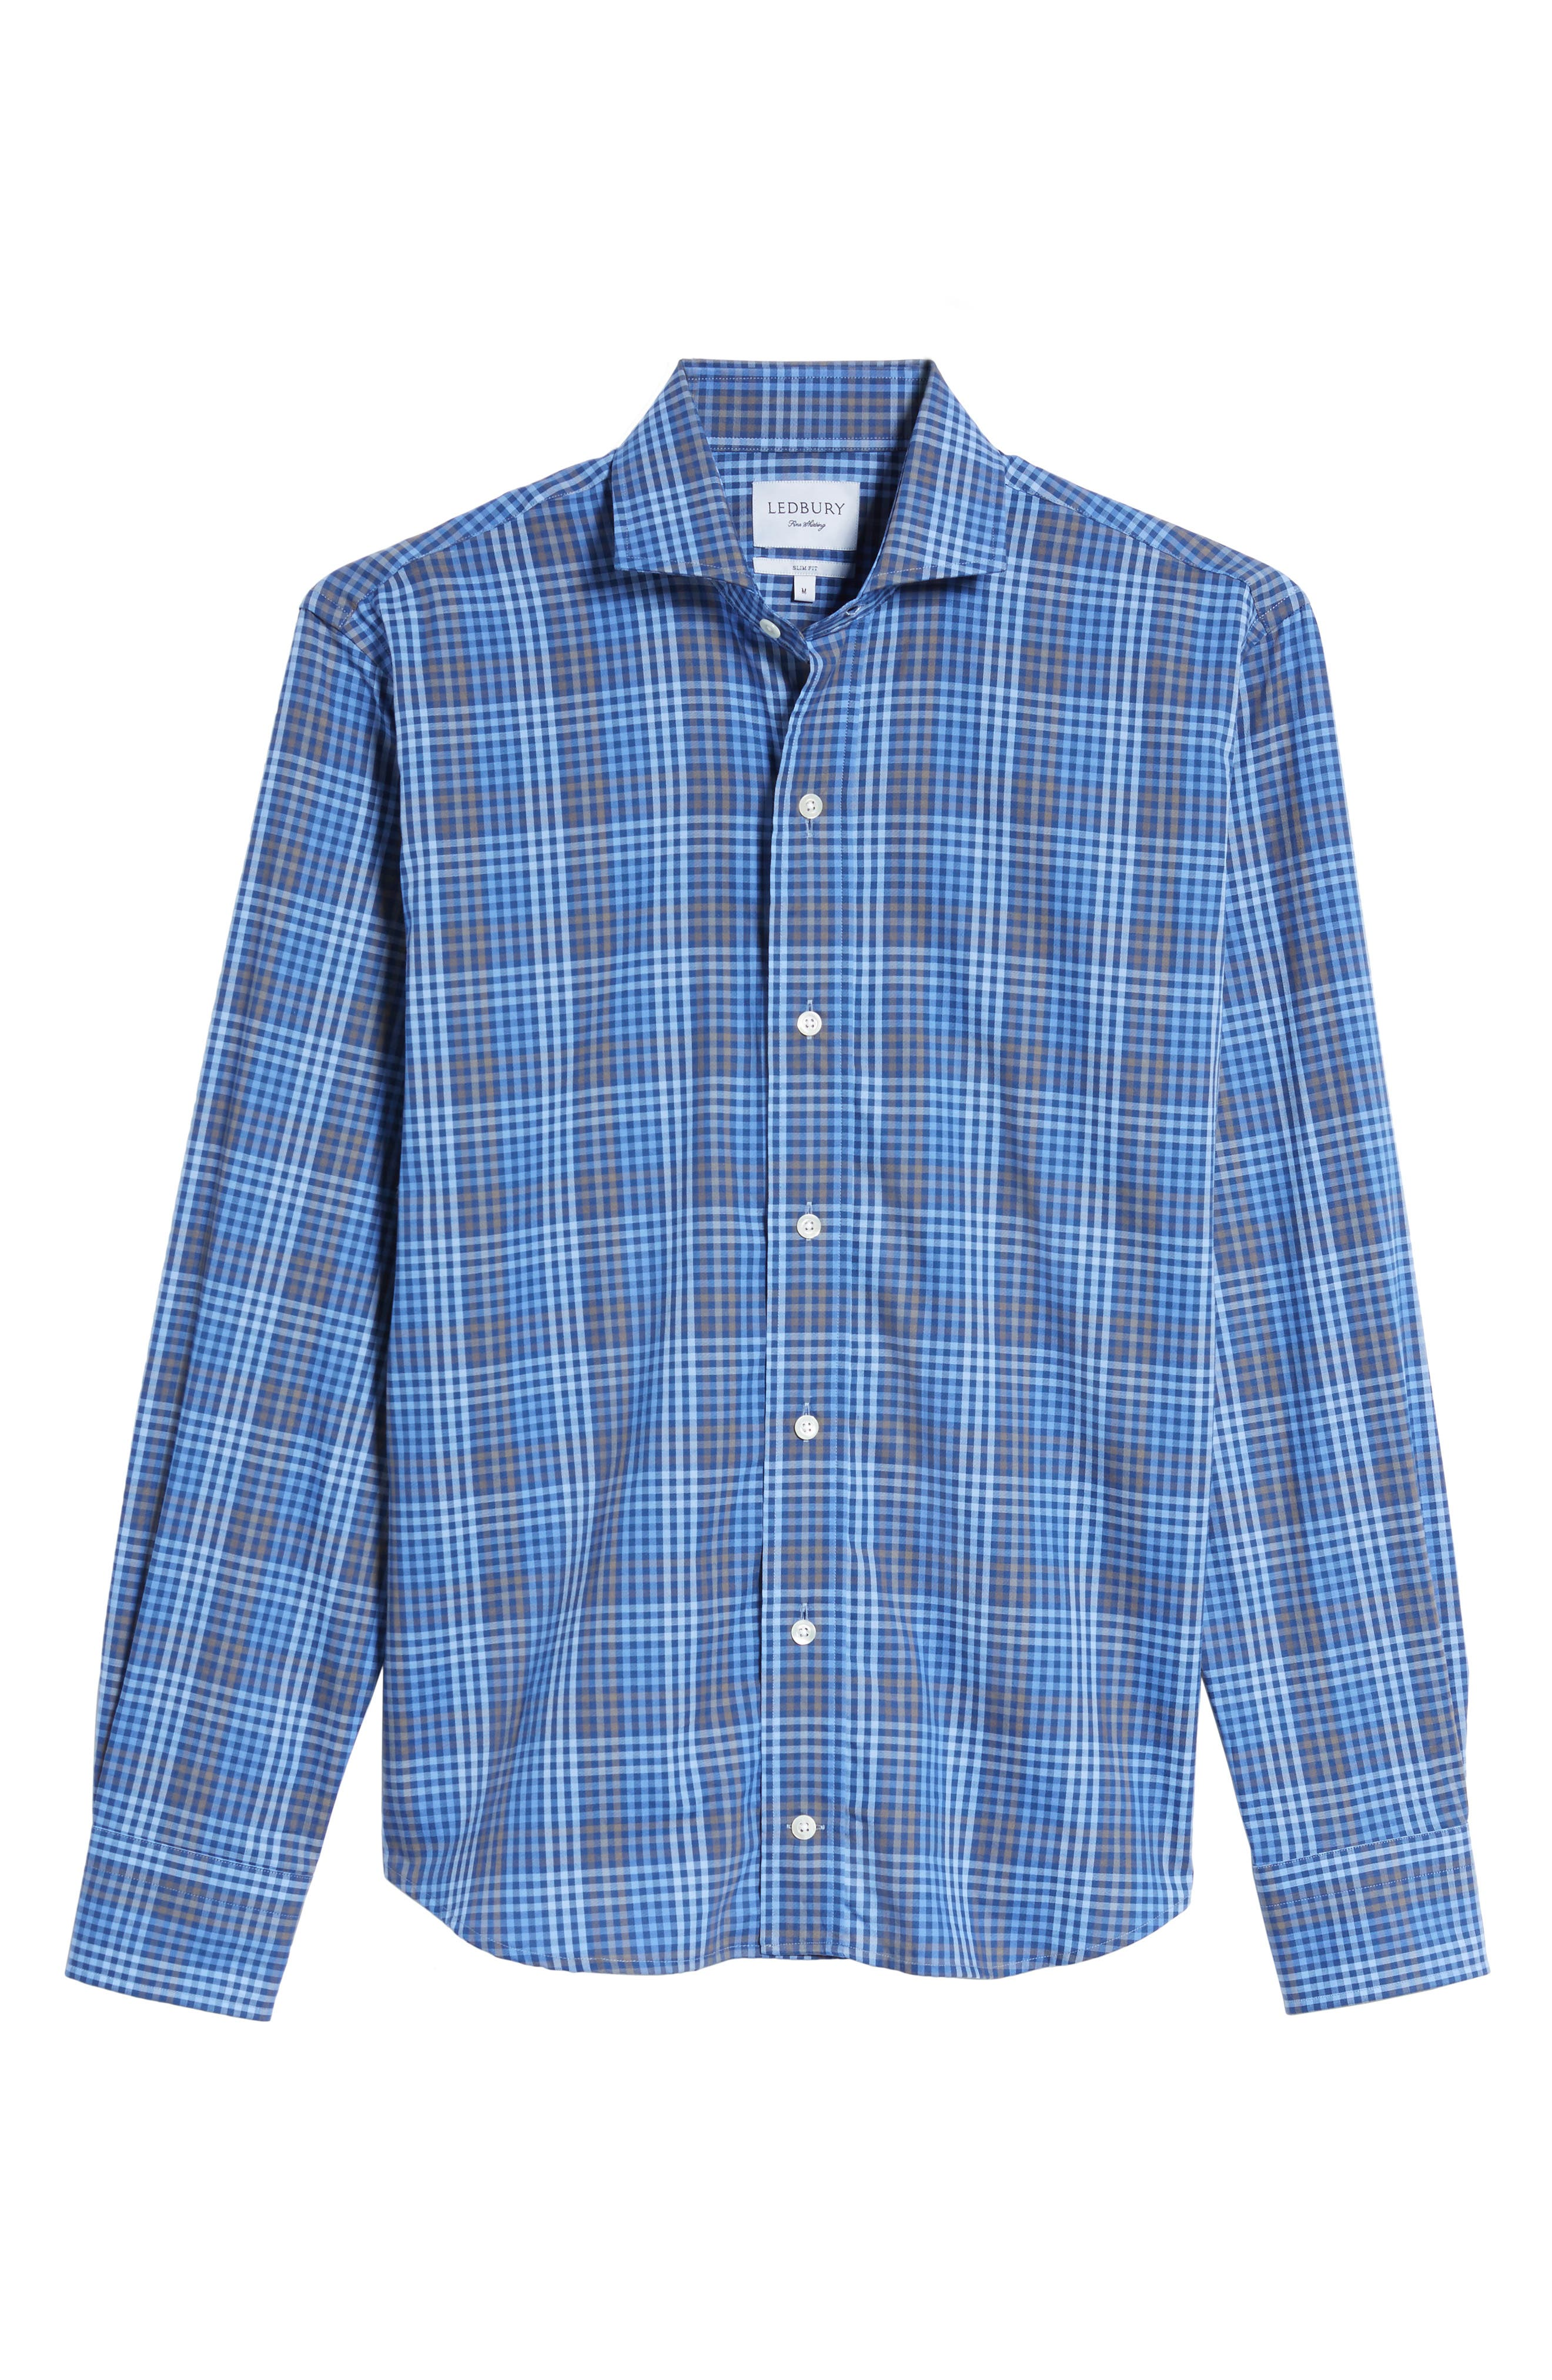 Alden Slim Fit Check Sport Shirt,                             Alternate thumbnail 6, color,                             400